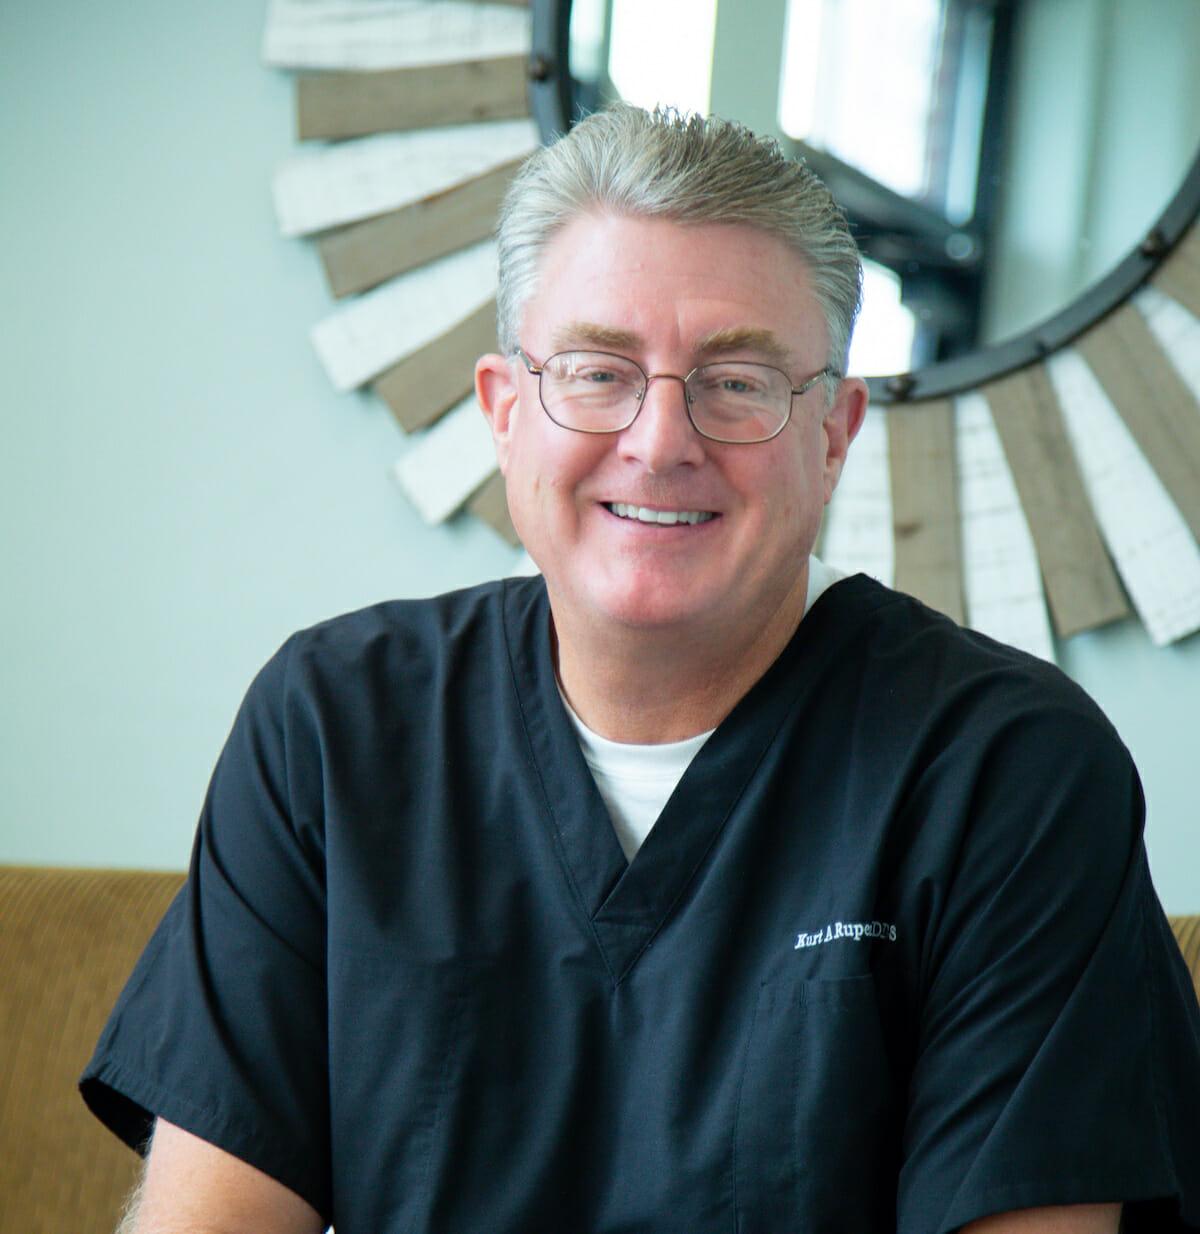 Dr. Rupenthal